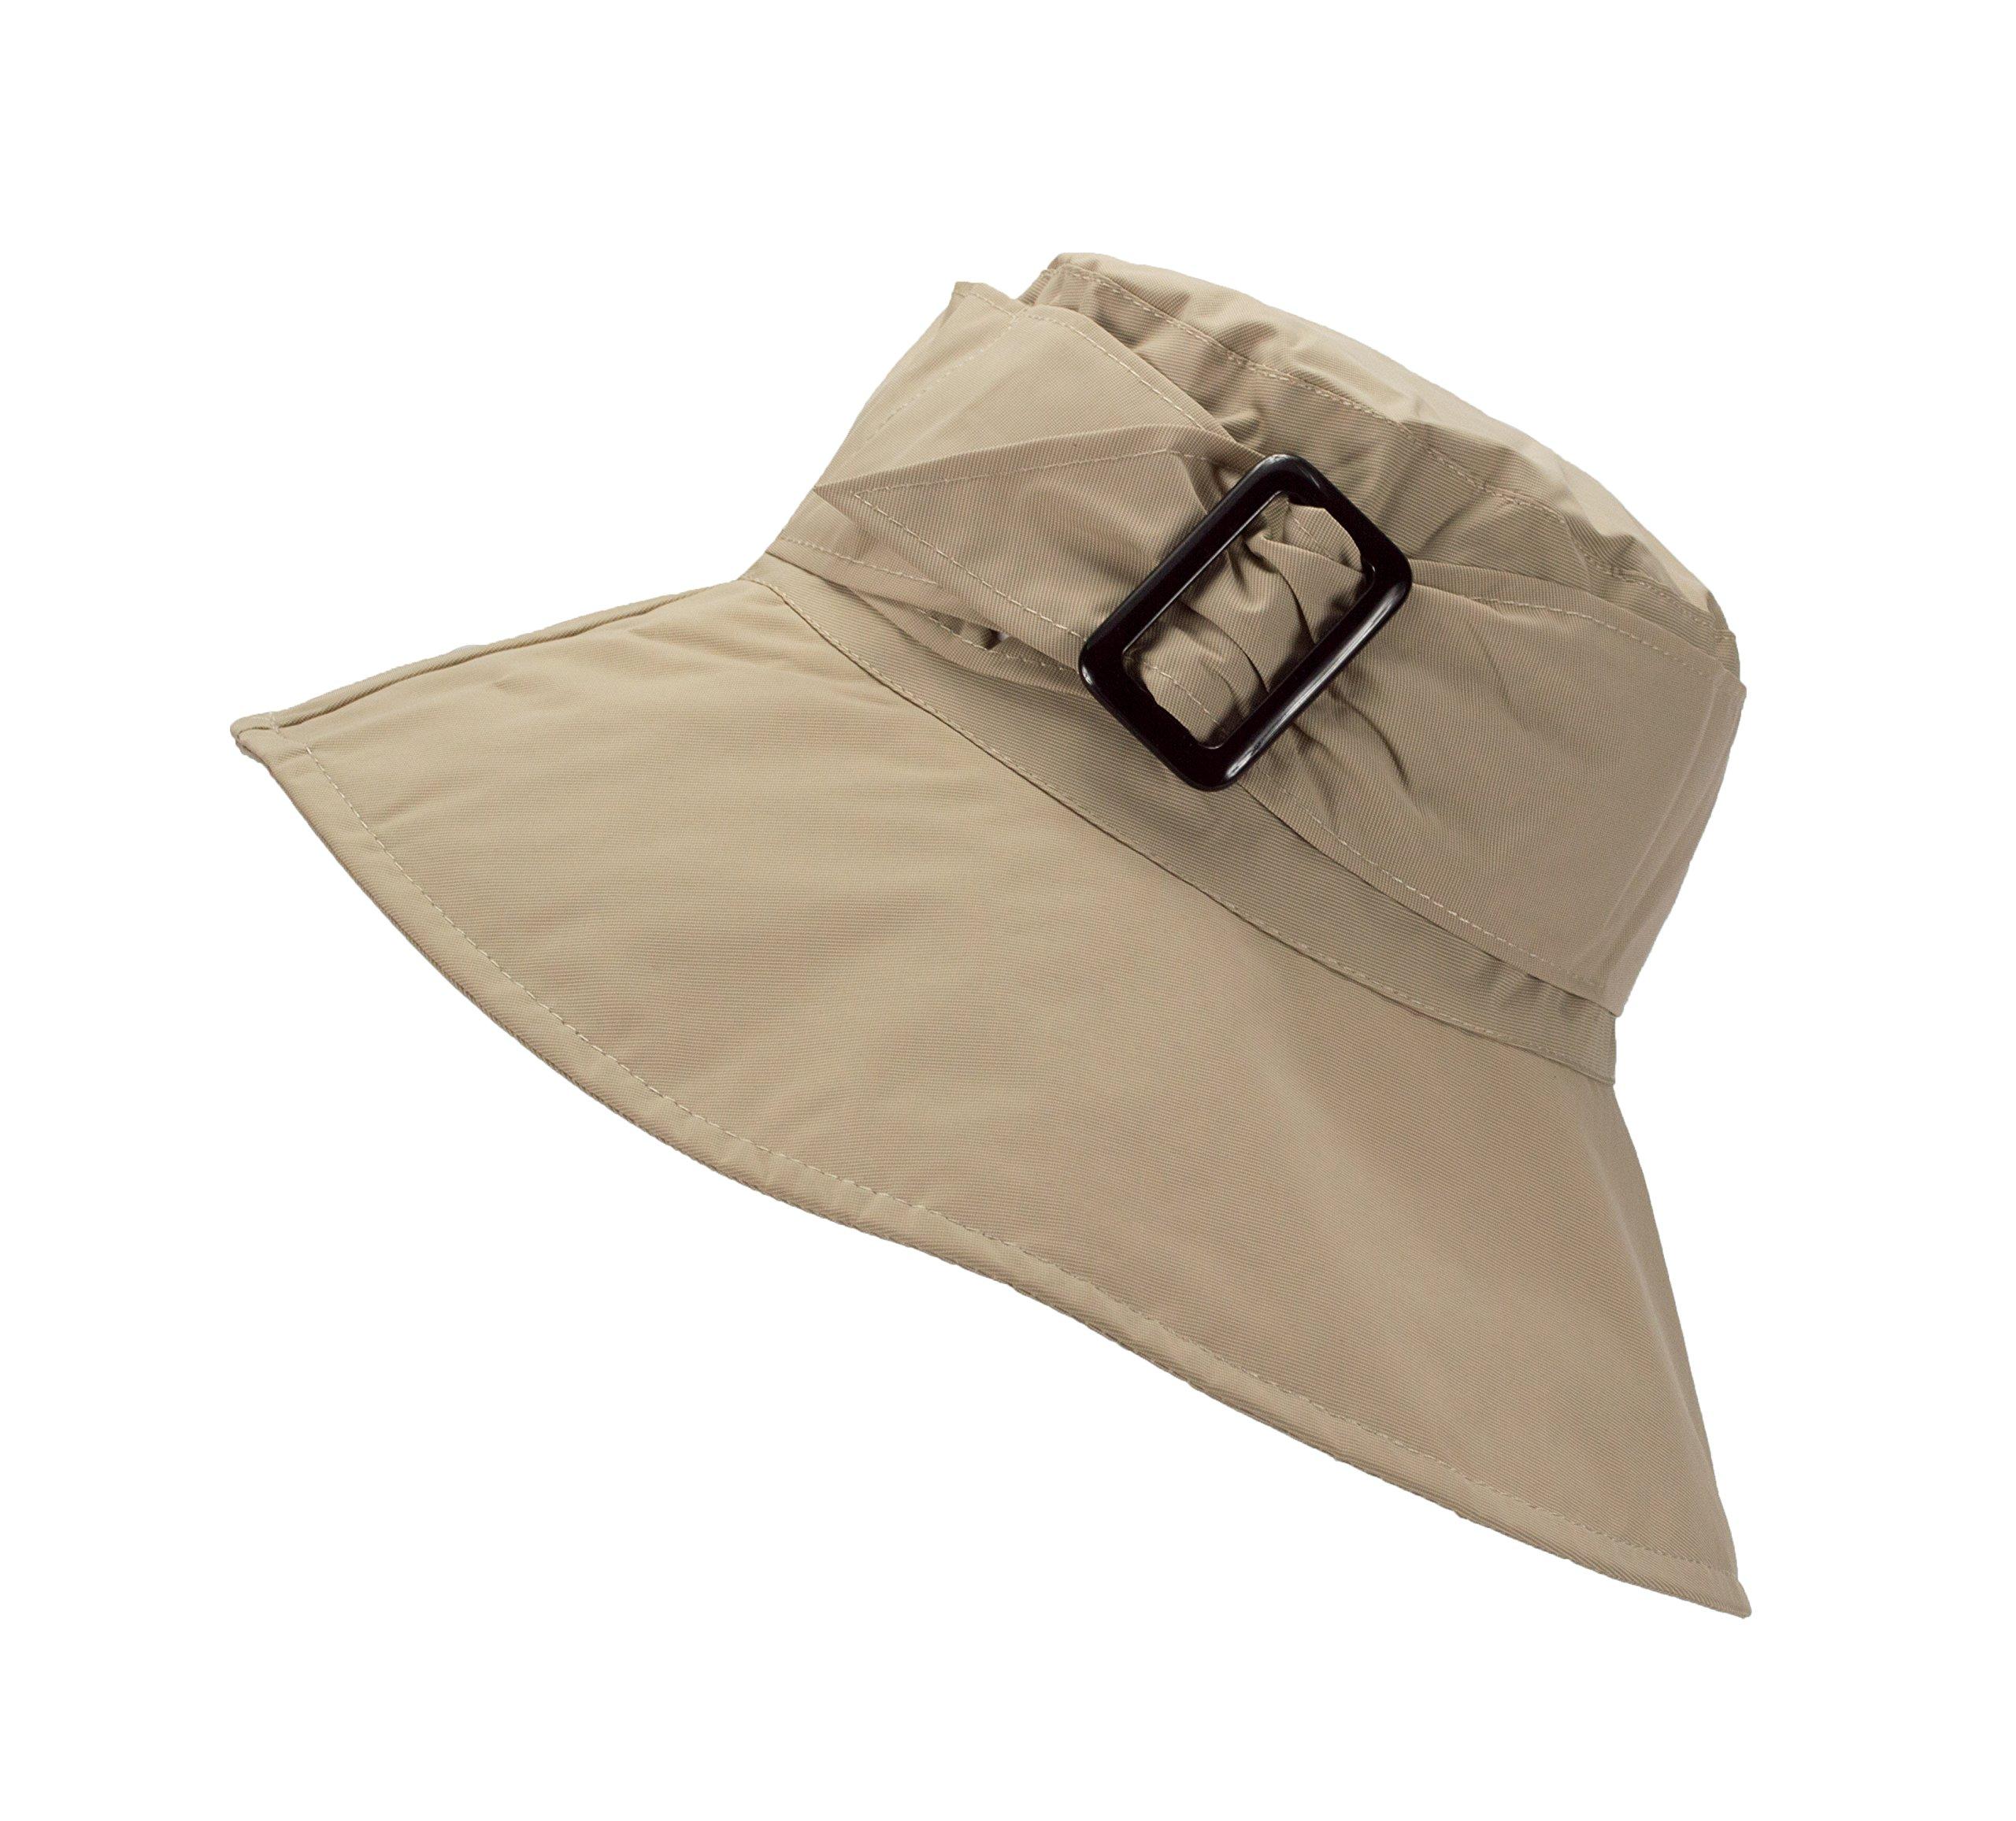 FLH Cute Bucket Rain Hat w/Buckle Accent, 3.5 inch Wide Brim, Roll-Up Packable (Khaki)